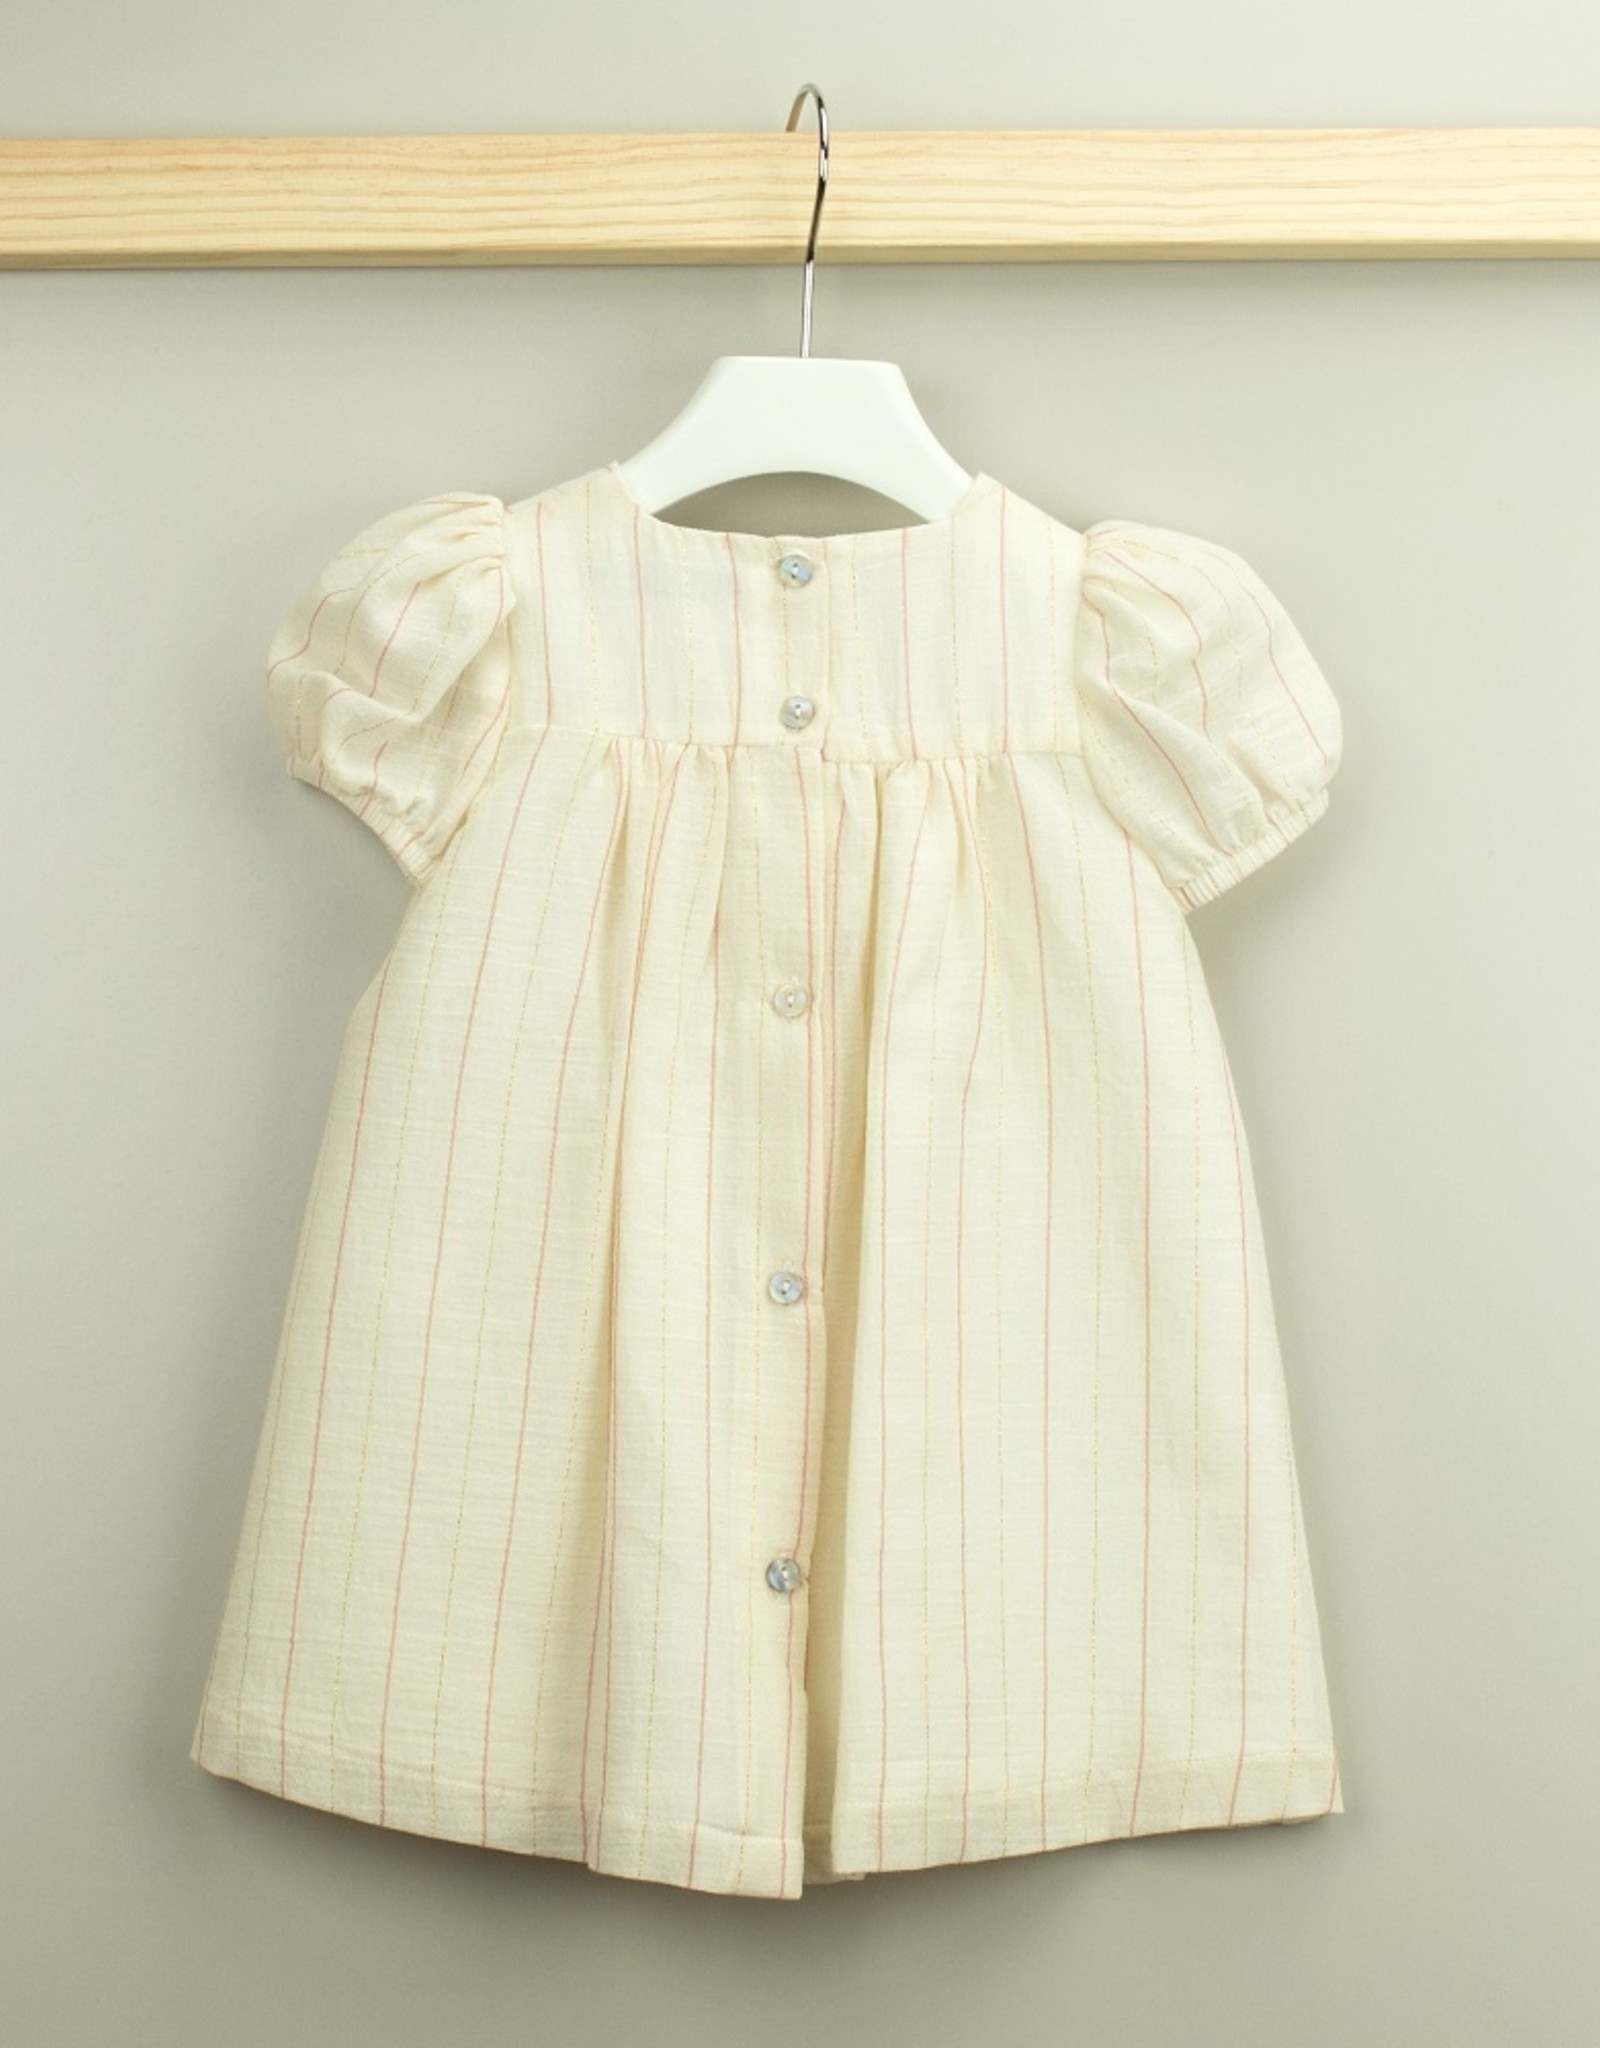 Babidu Eva S/S Dress